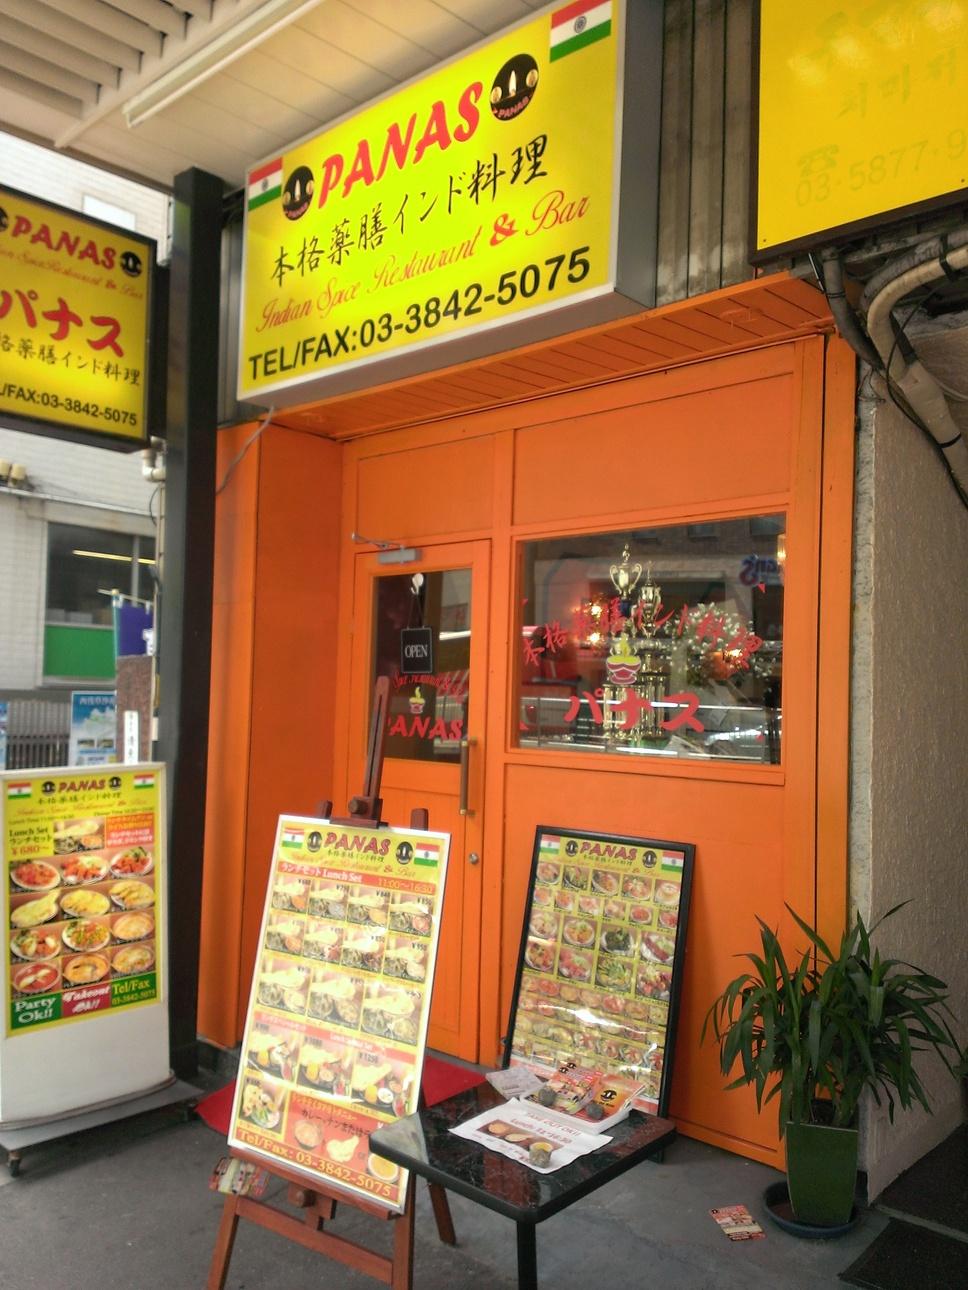 PANAS 浅草店